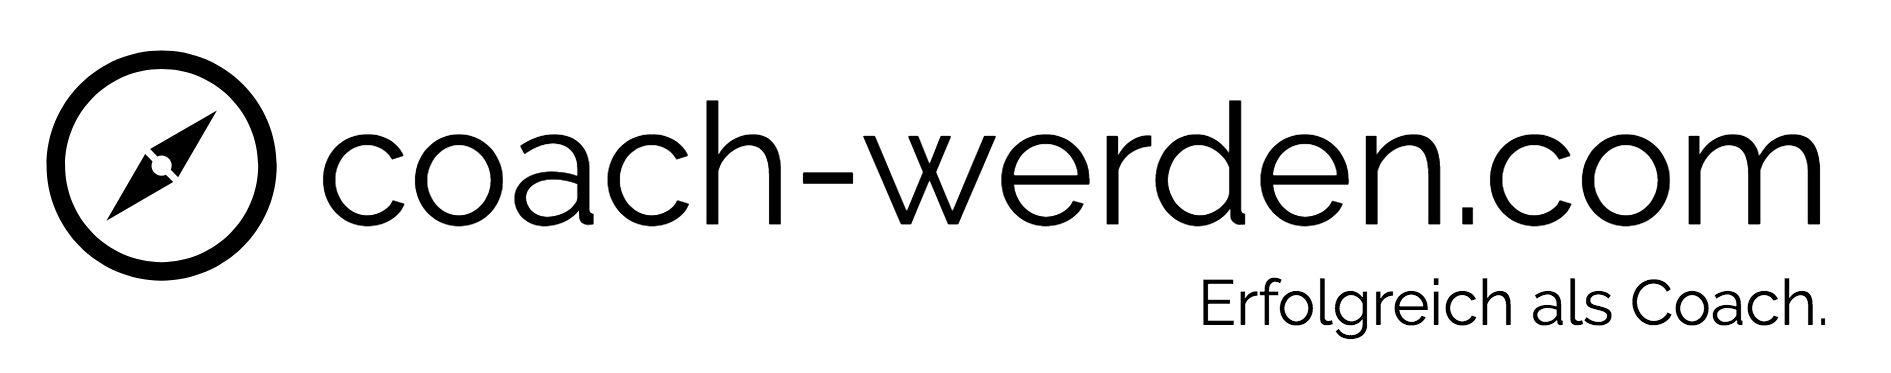 coach-werden.com logo